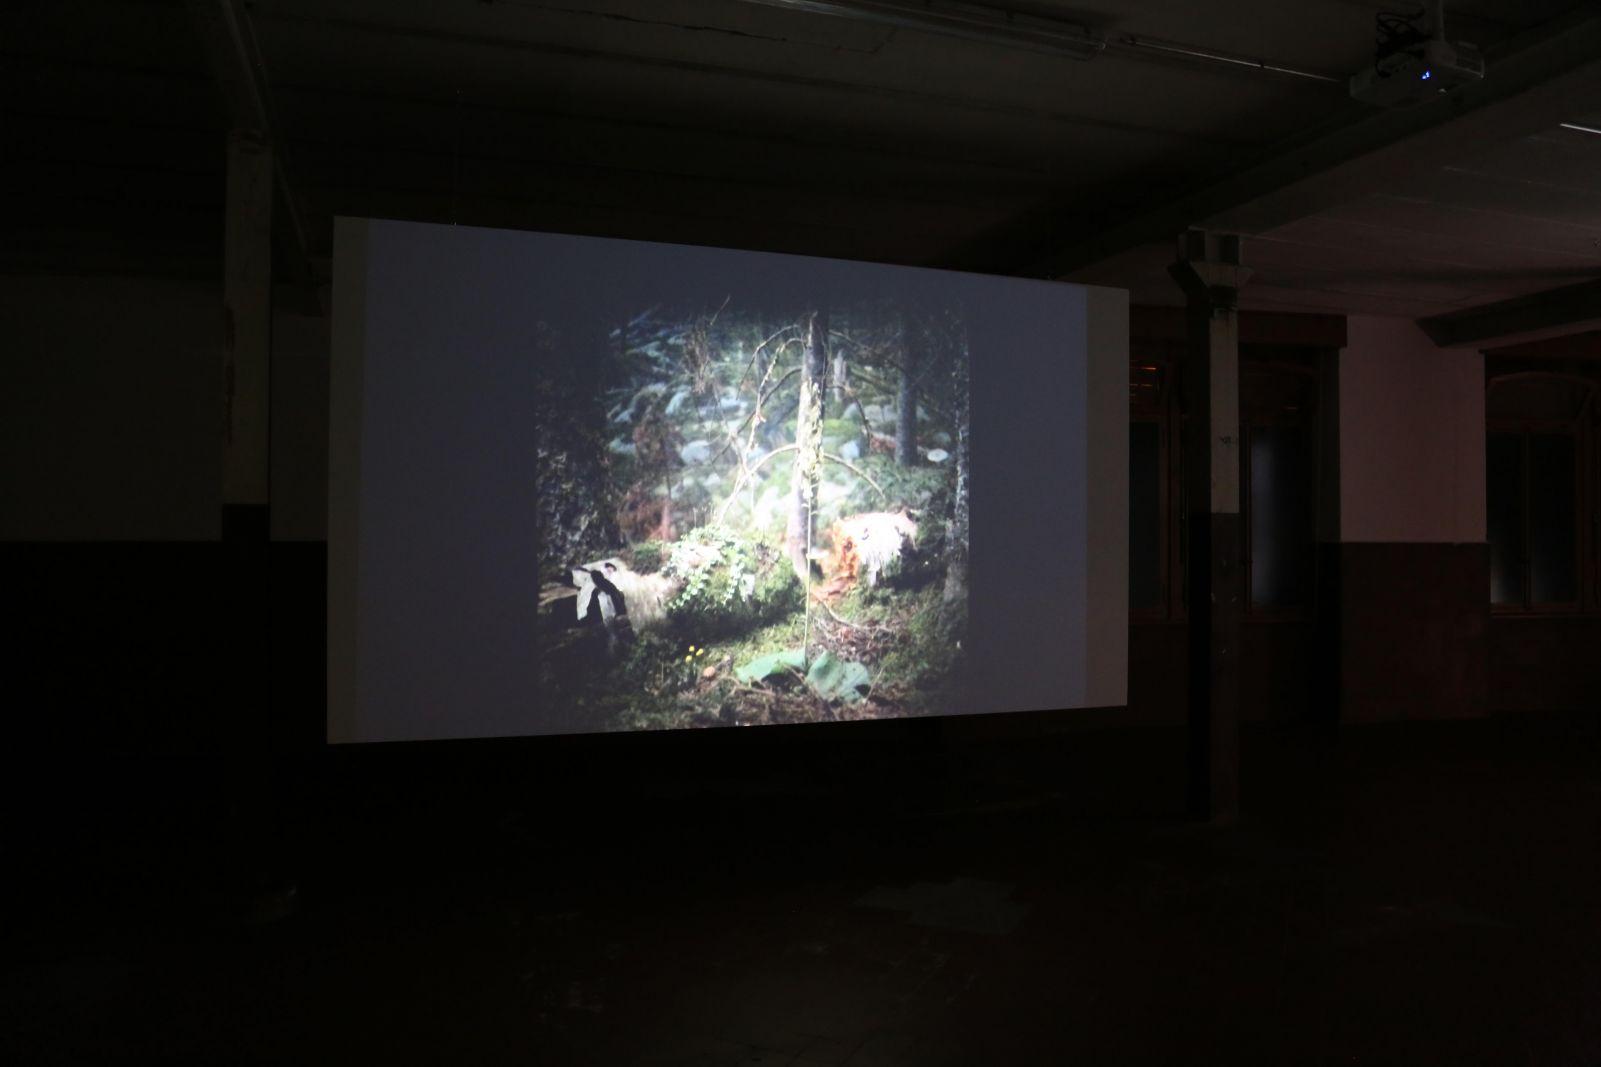 Glass_Scape Slideshow (2019) - Virginia Inés Vergara